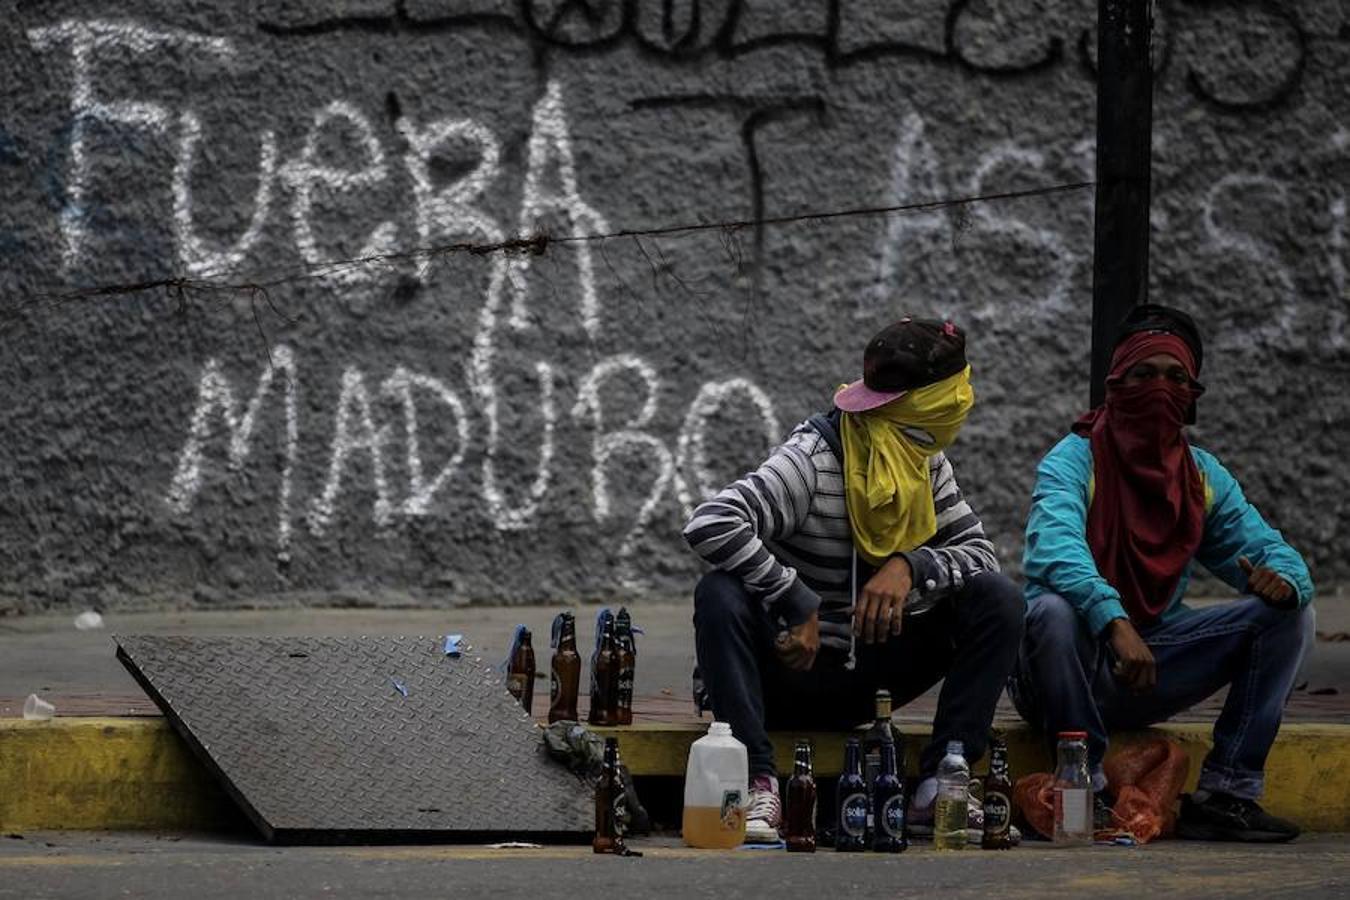 https://i0.wp.com/www.abc.es/media/MM/2017/07/26/huelga-general-venezuela-kDyE--1350x900@abc.jpg